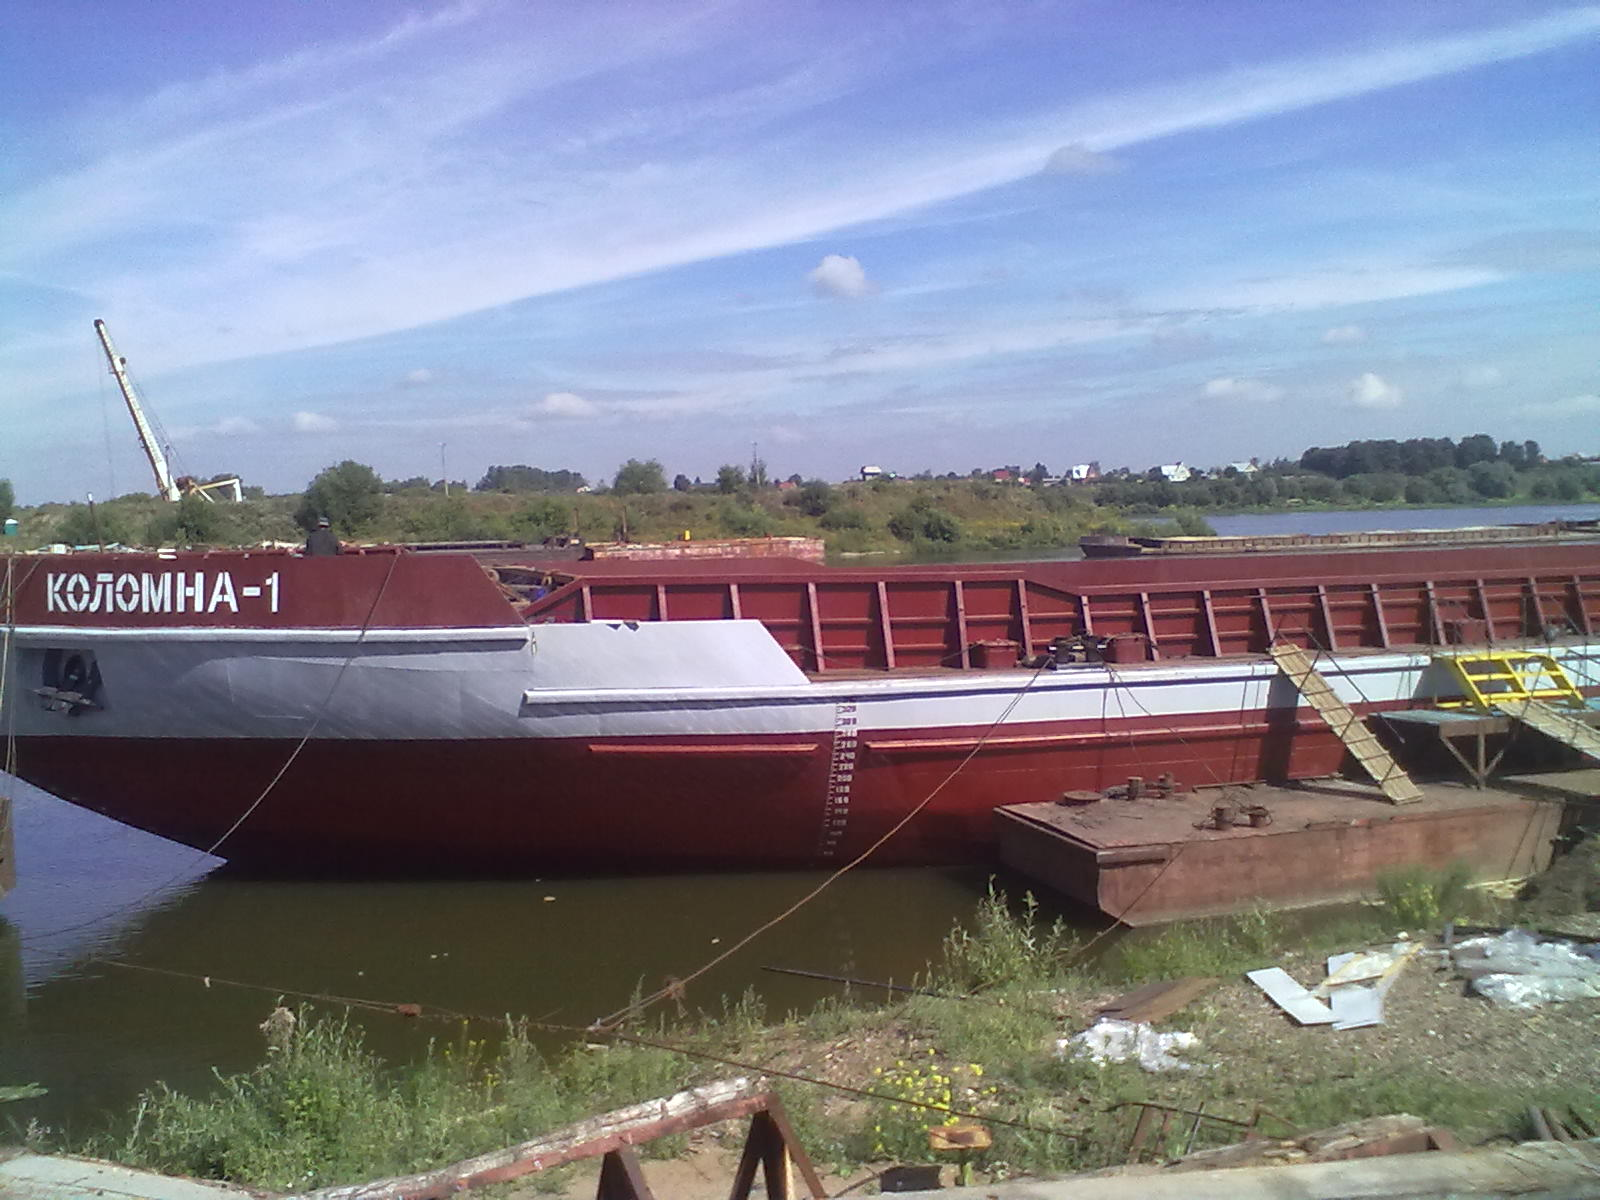 ОАО «Порт Коломна» г. Коломна-сухогруз